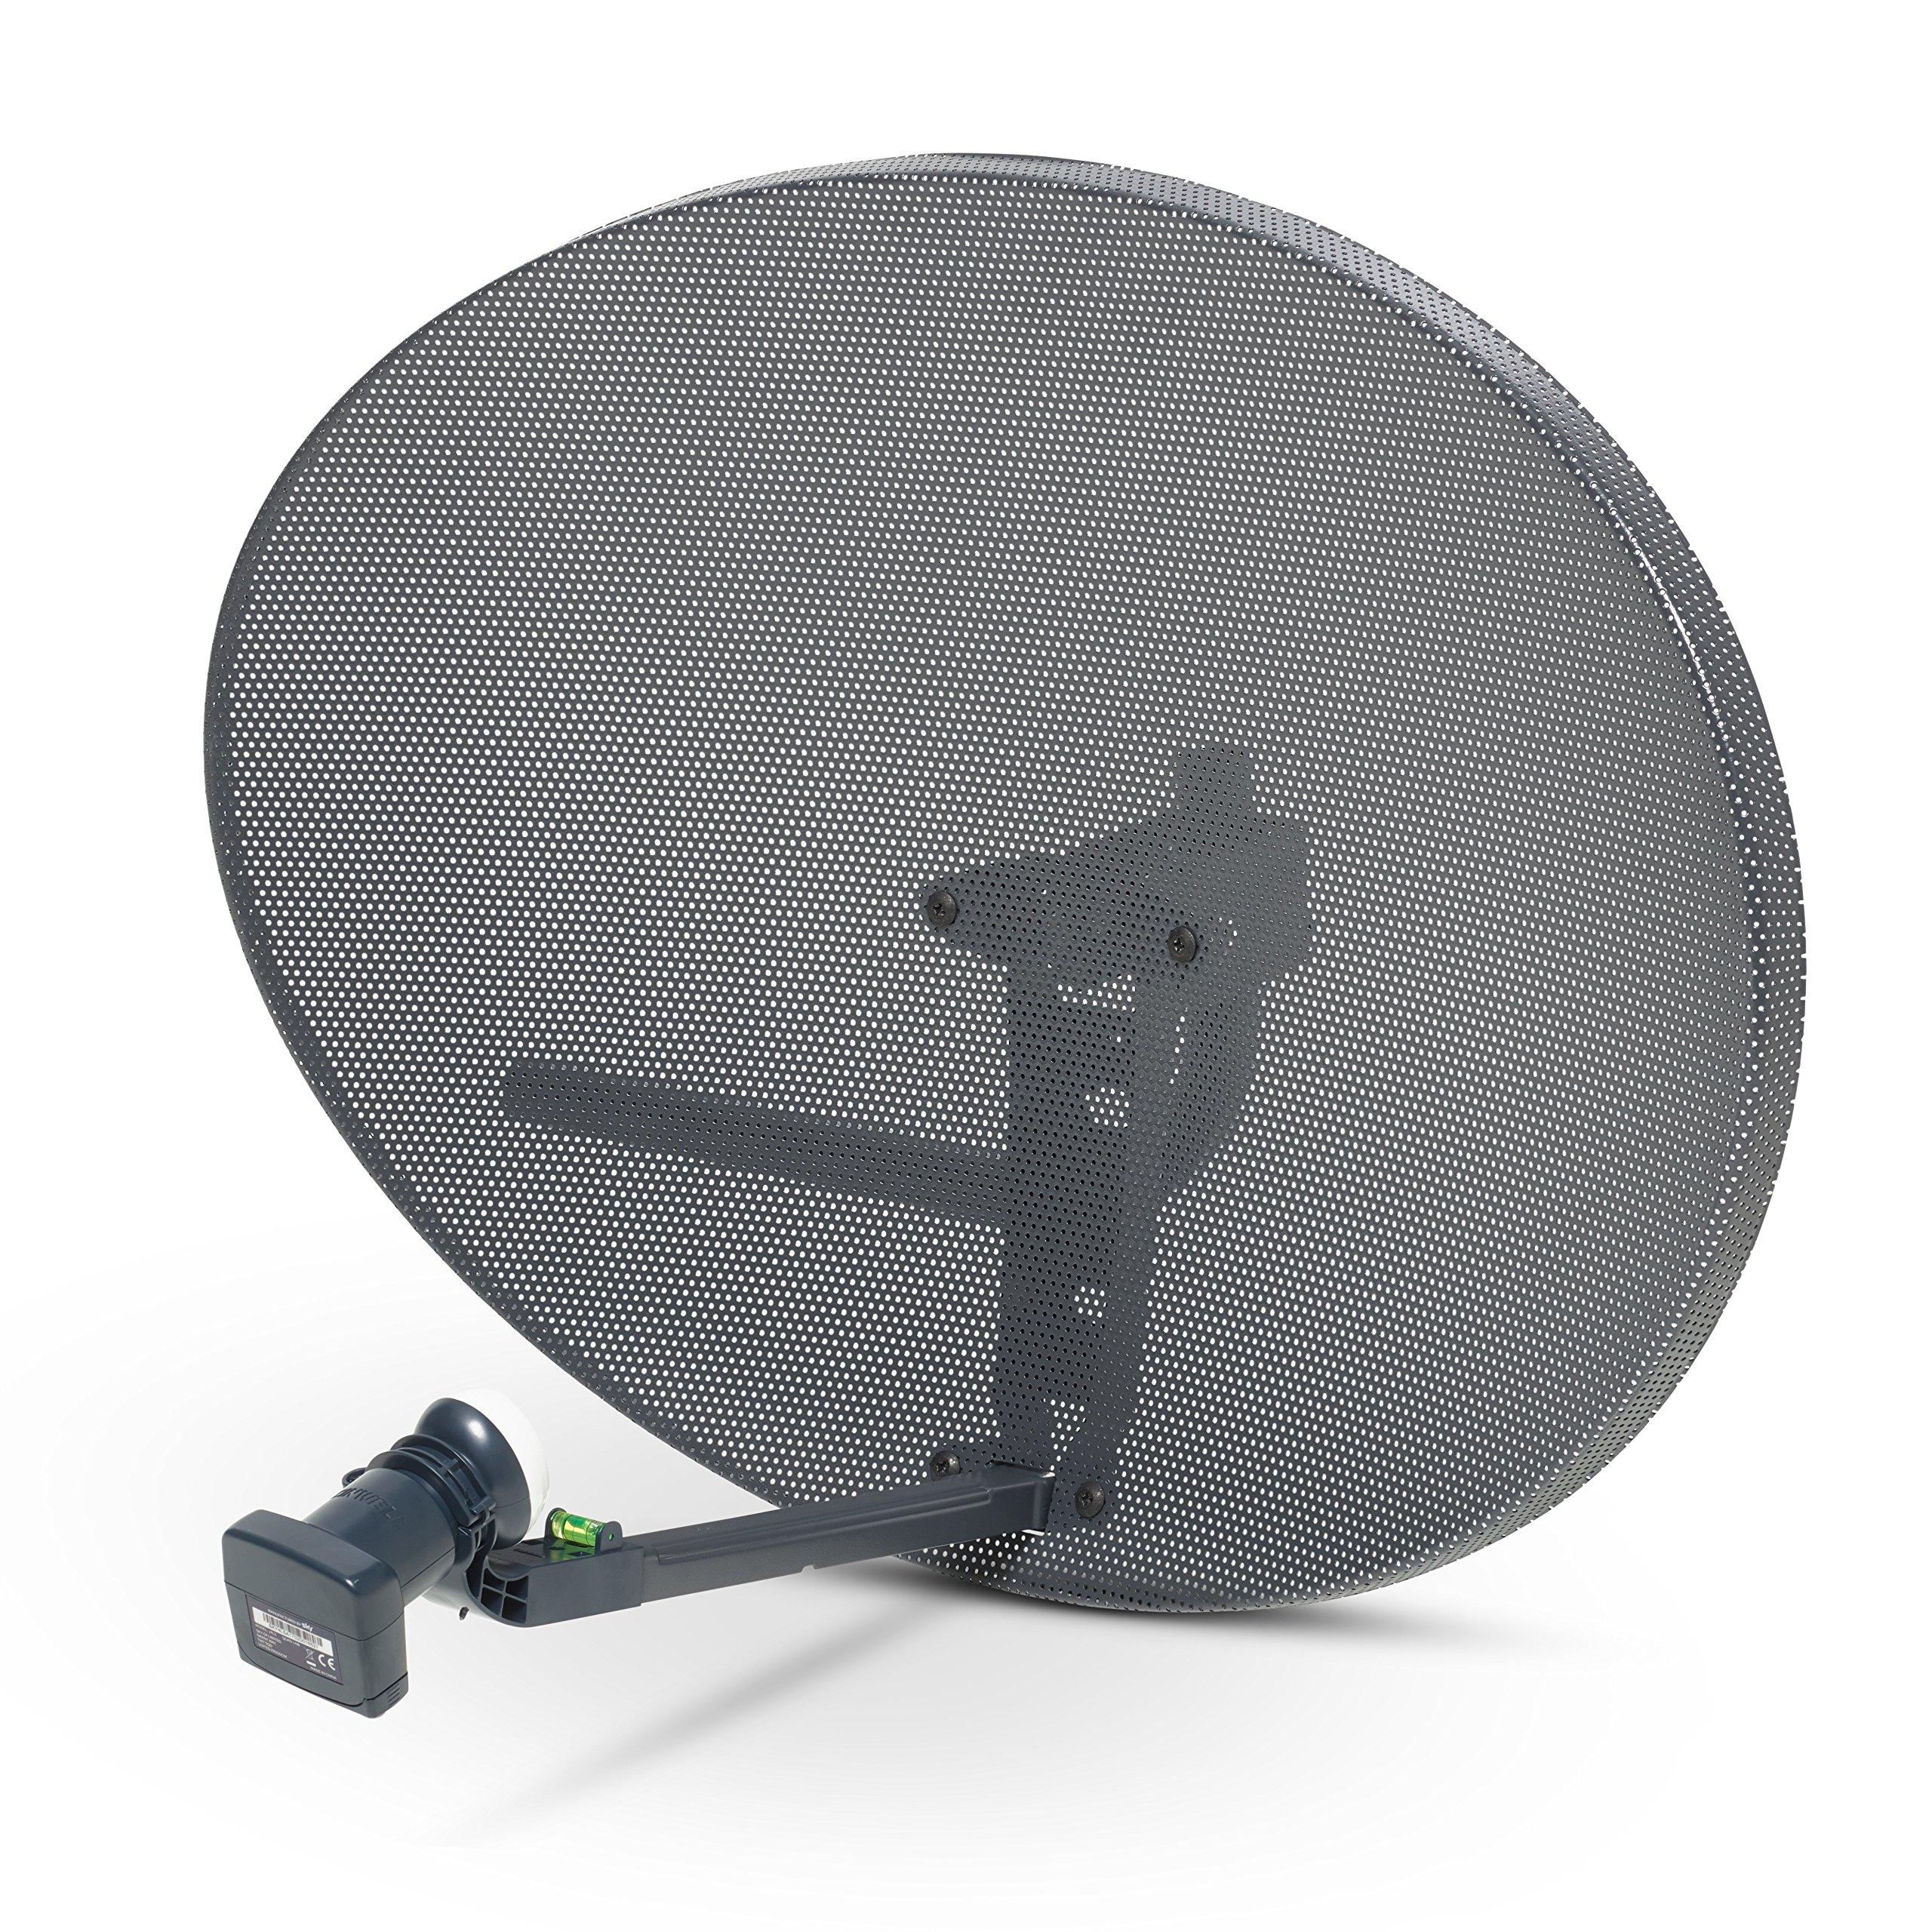 Sky Satellites Zone 2 Satellite Dish Quad Lnb For FreeSat Hotbird Astra Polesat